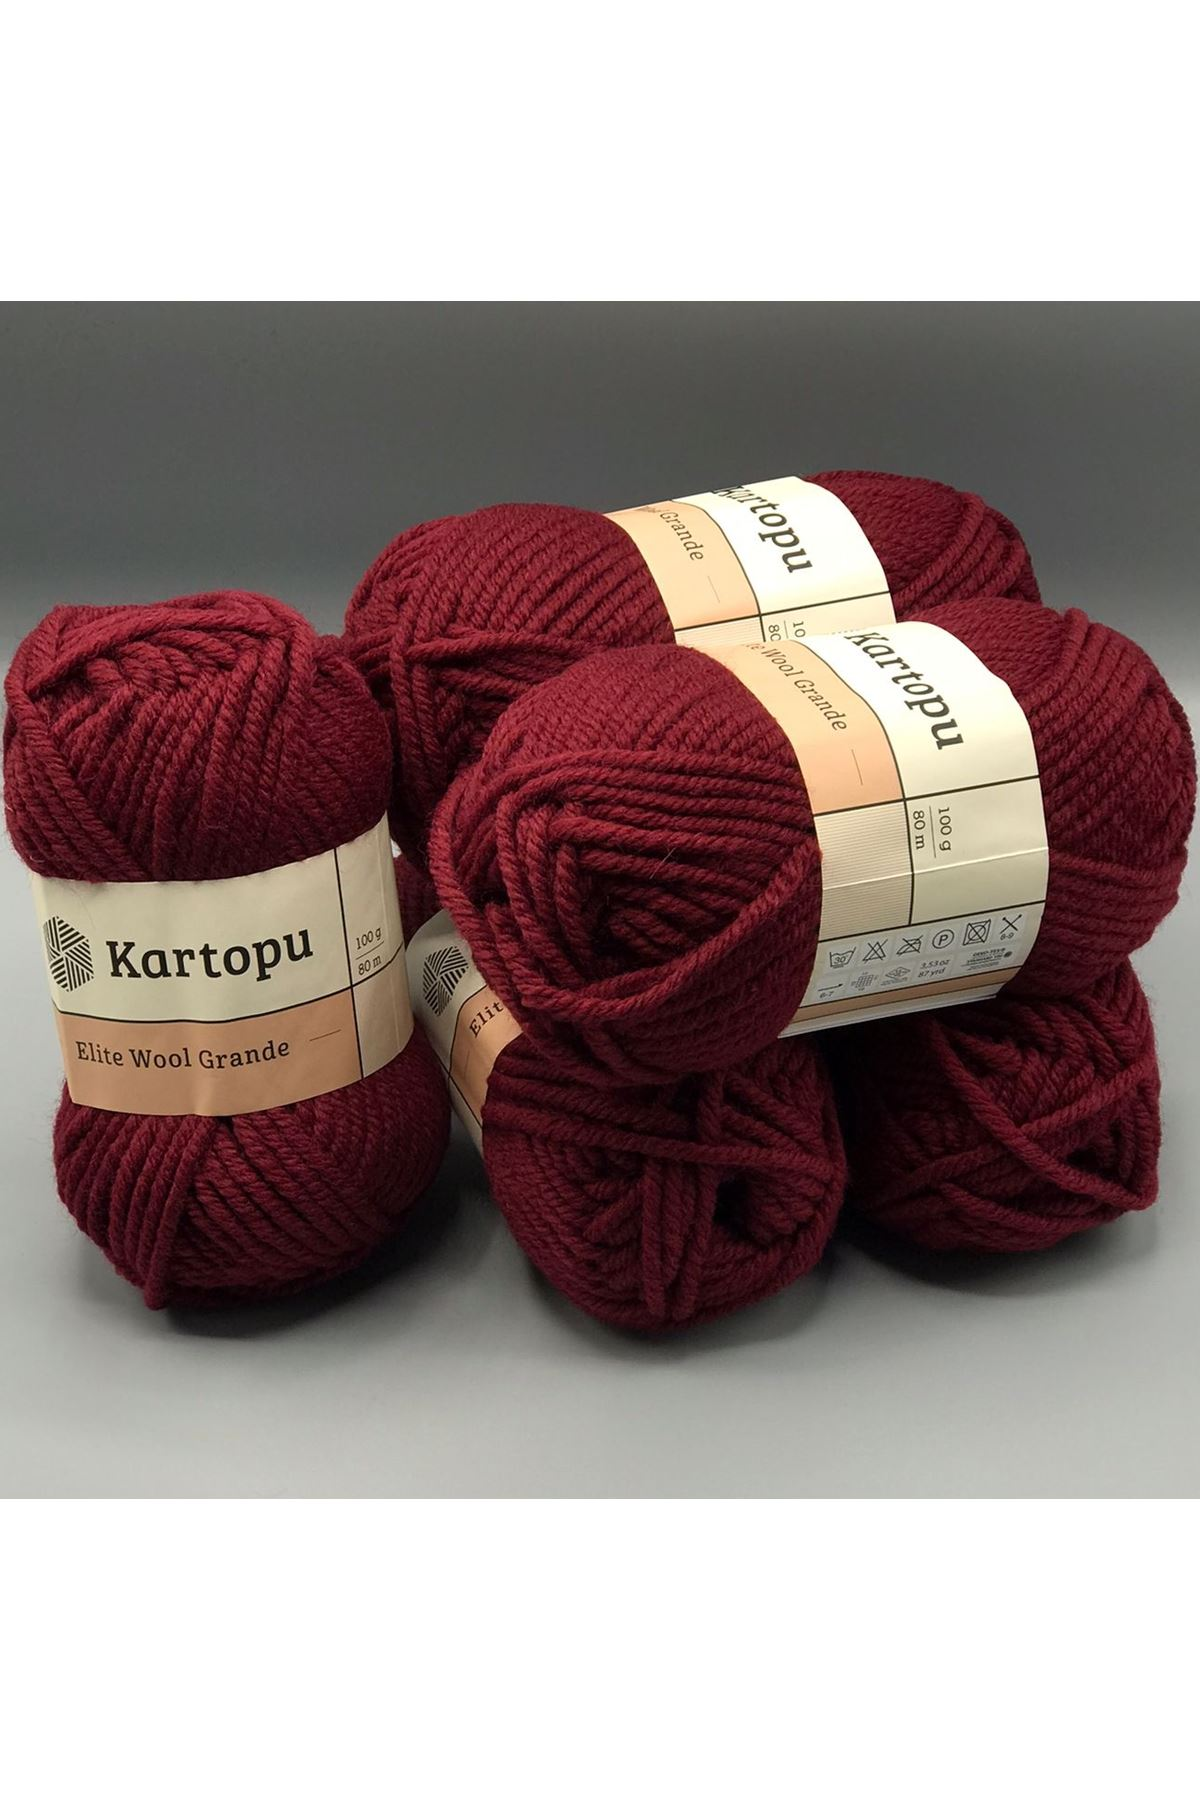 Kartopu Elite Wool Grande 5'li Paket K1104 Vişne